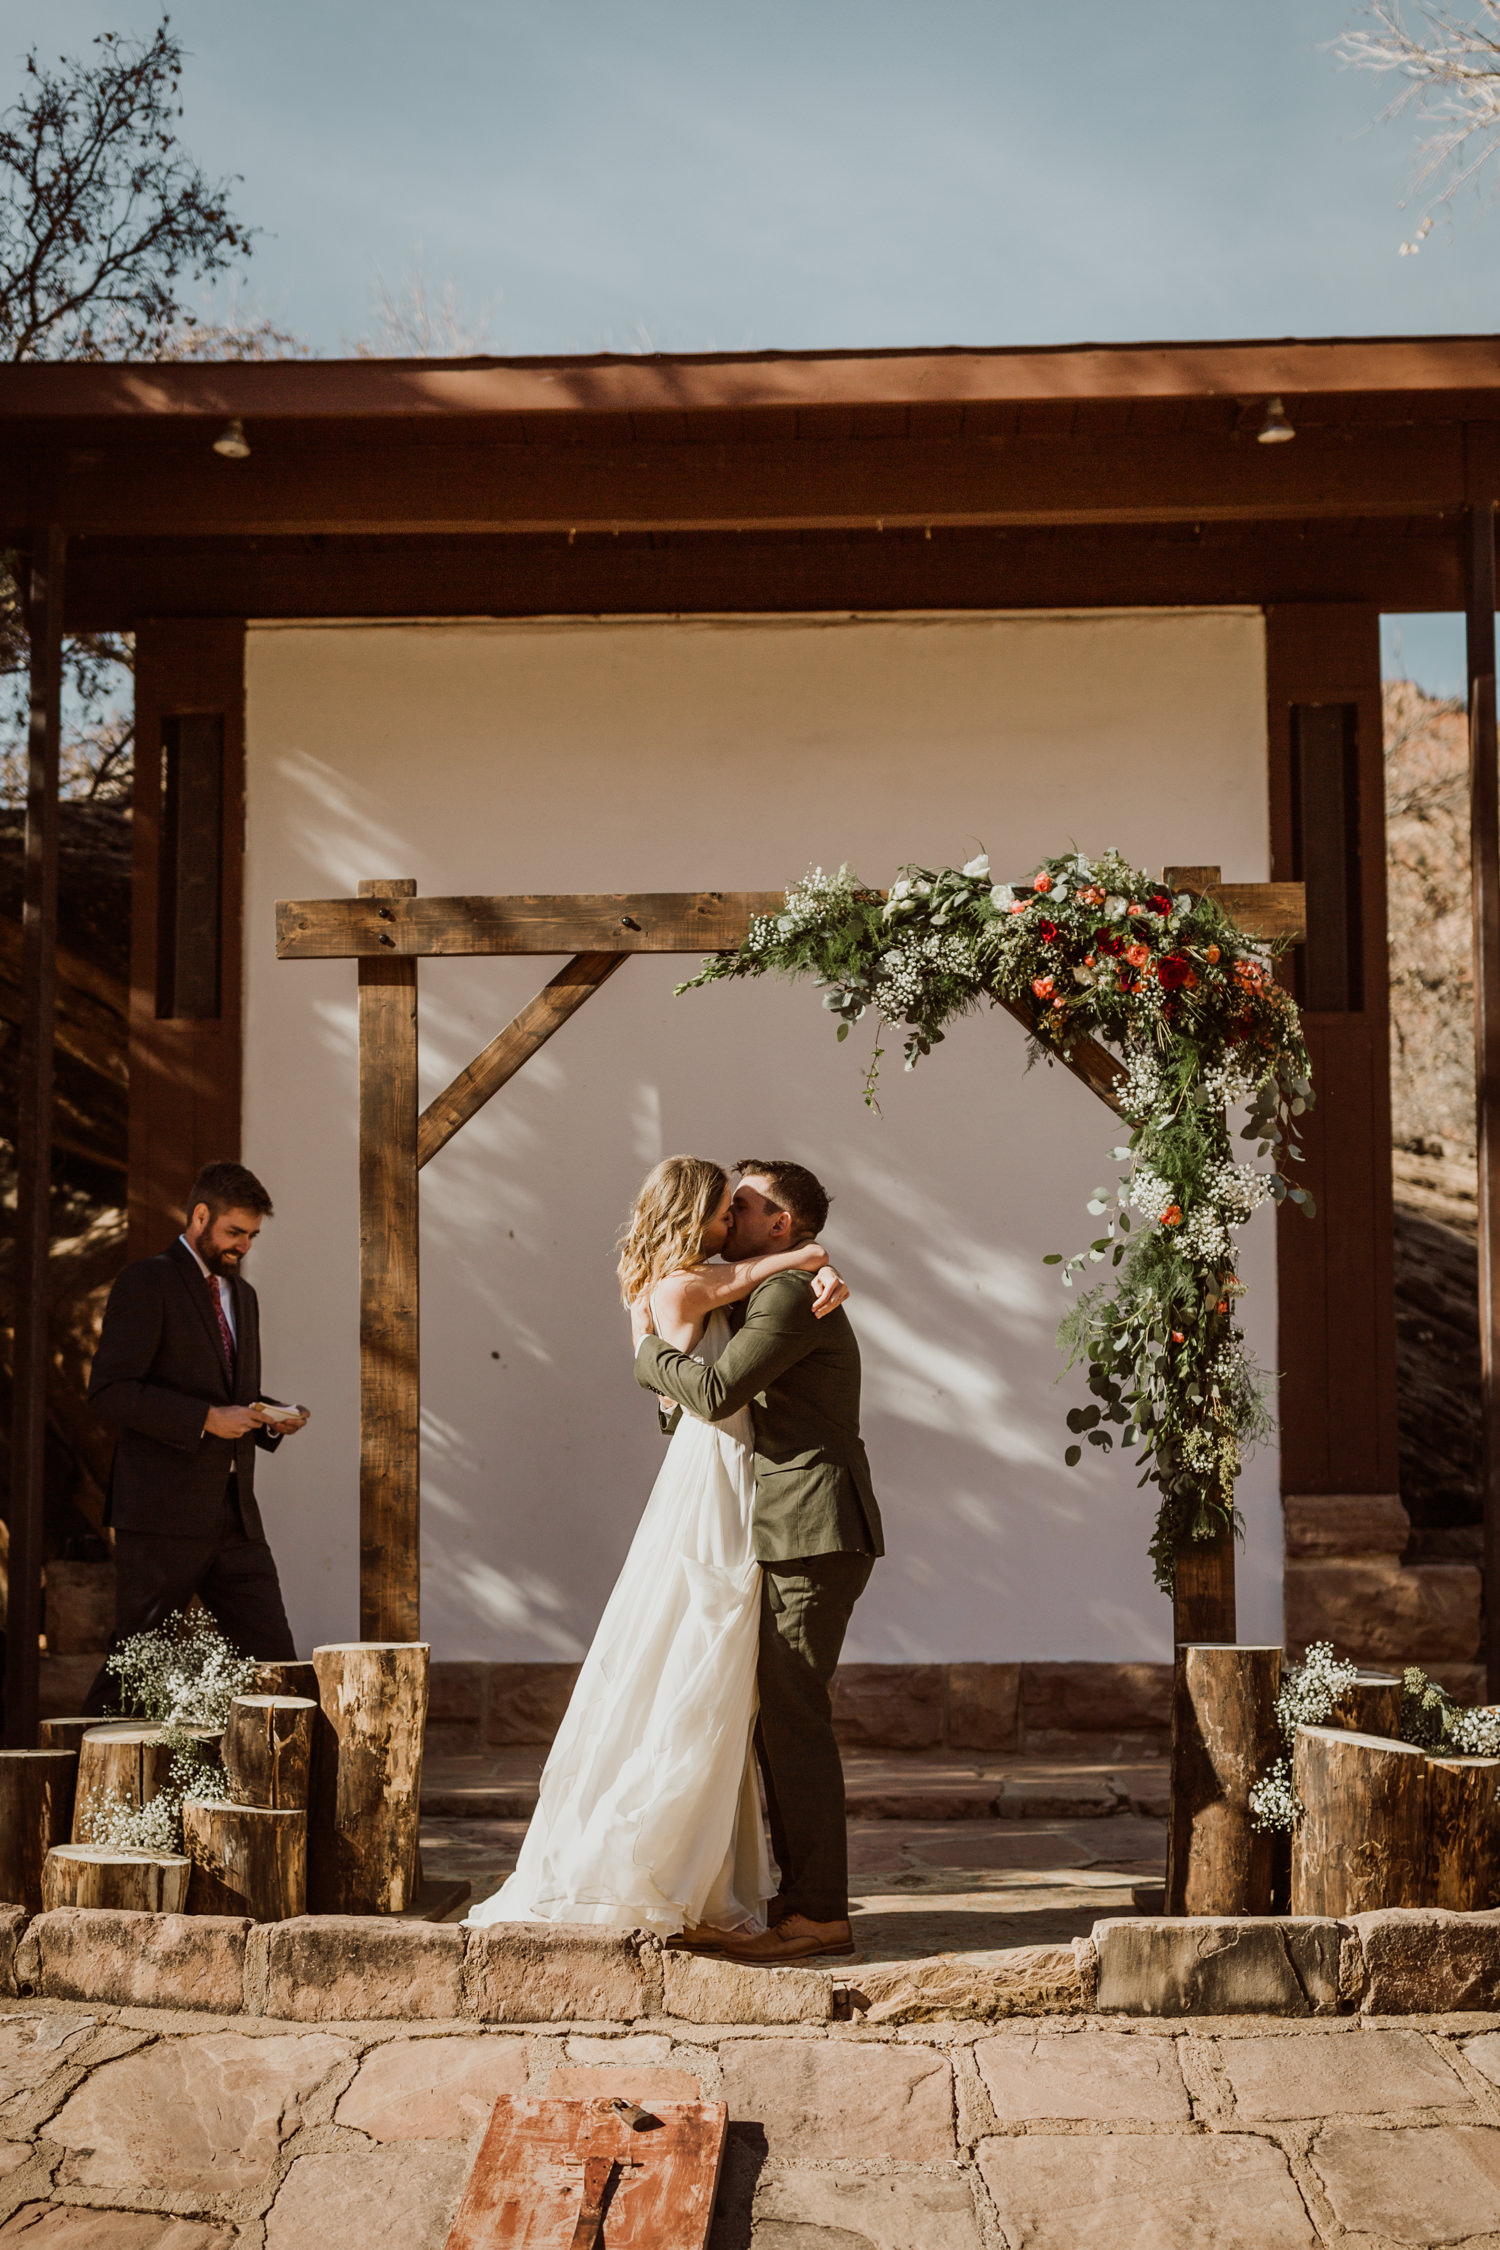 zion-national-park-wedding-84.jpg